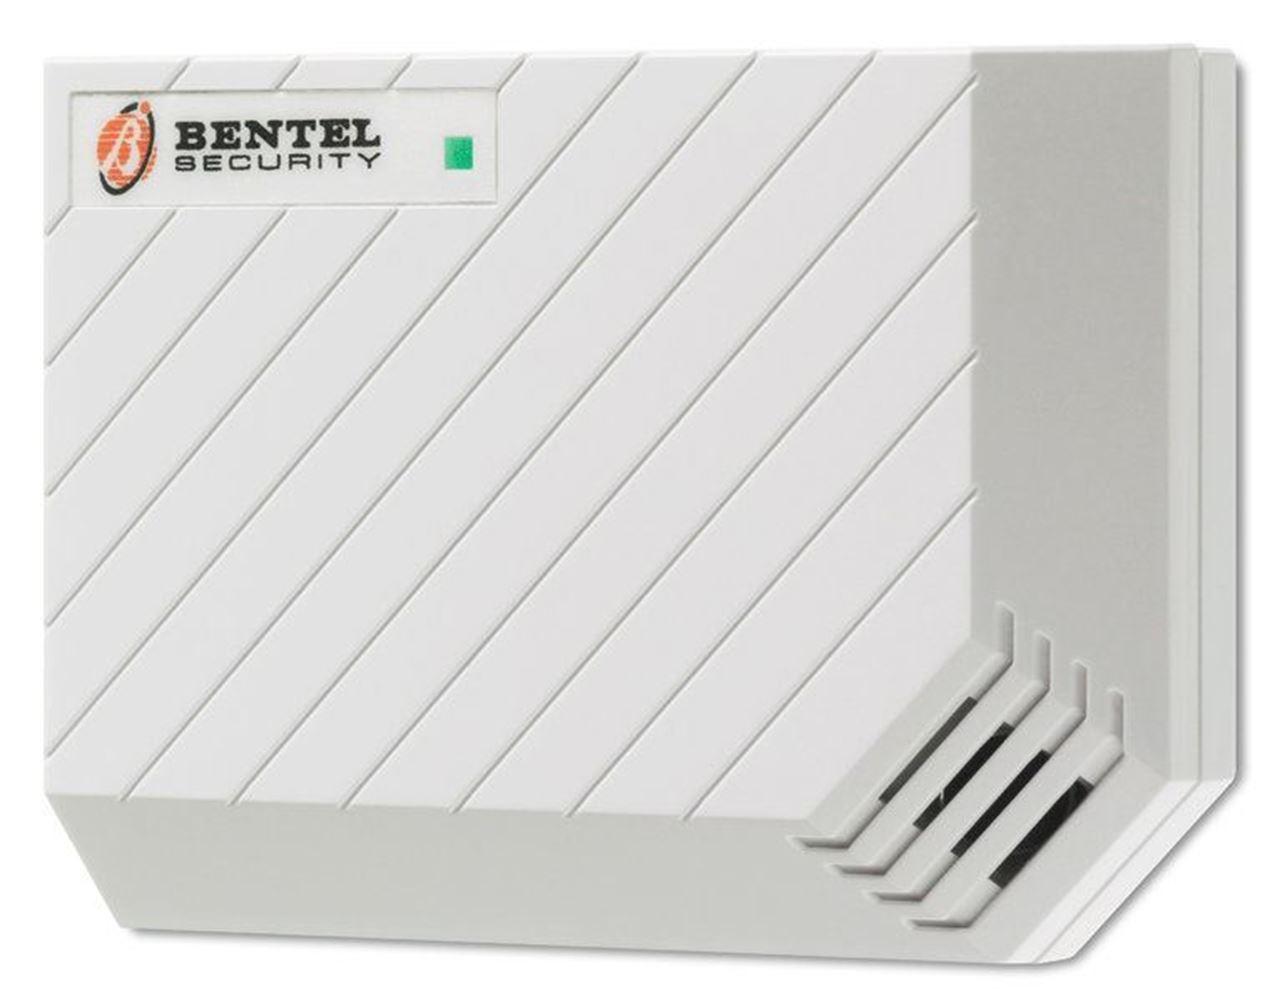 Bentel security GB08 - Framed-glass Shatter Detector Armenia Vantag